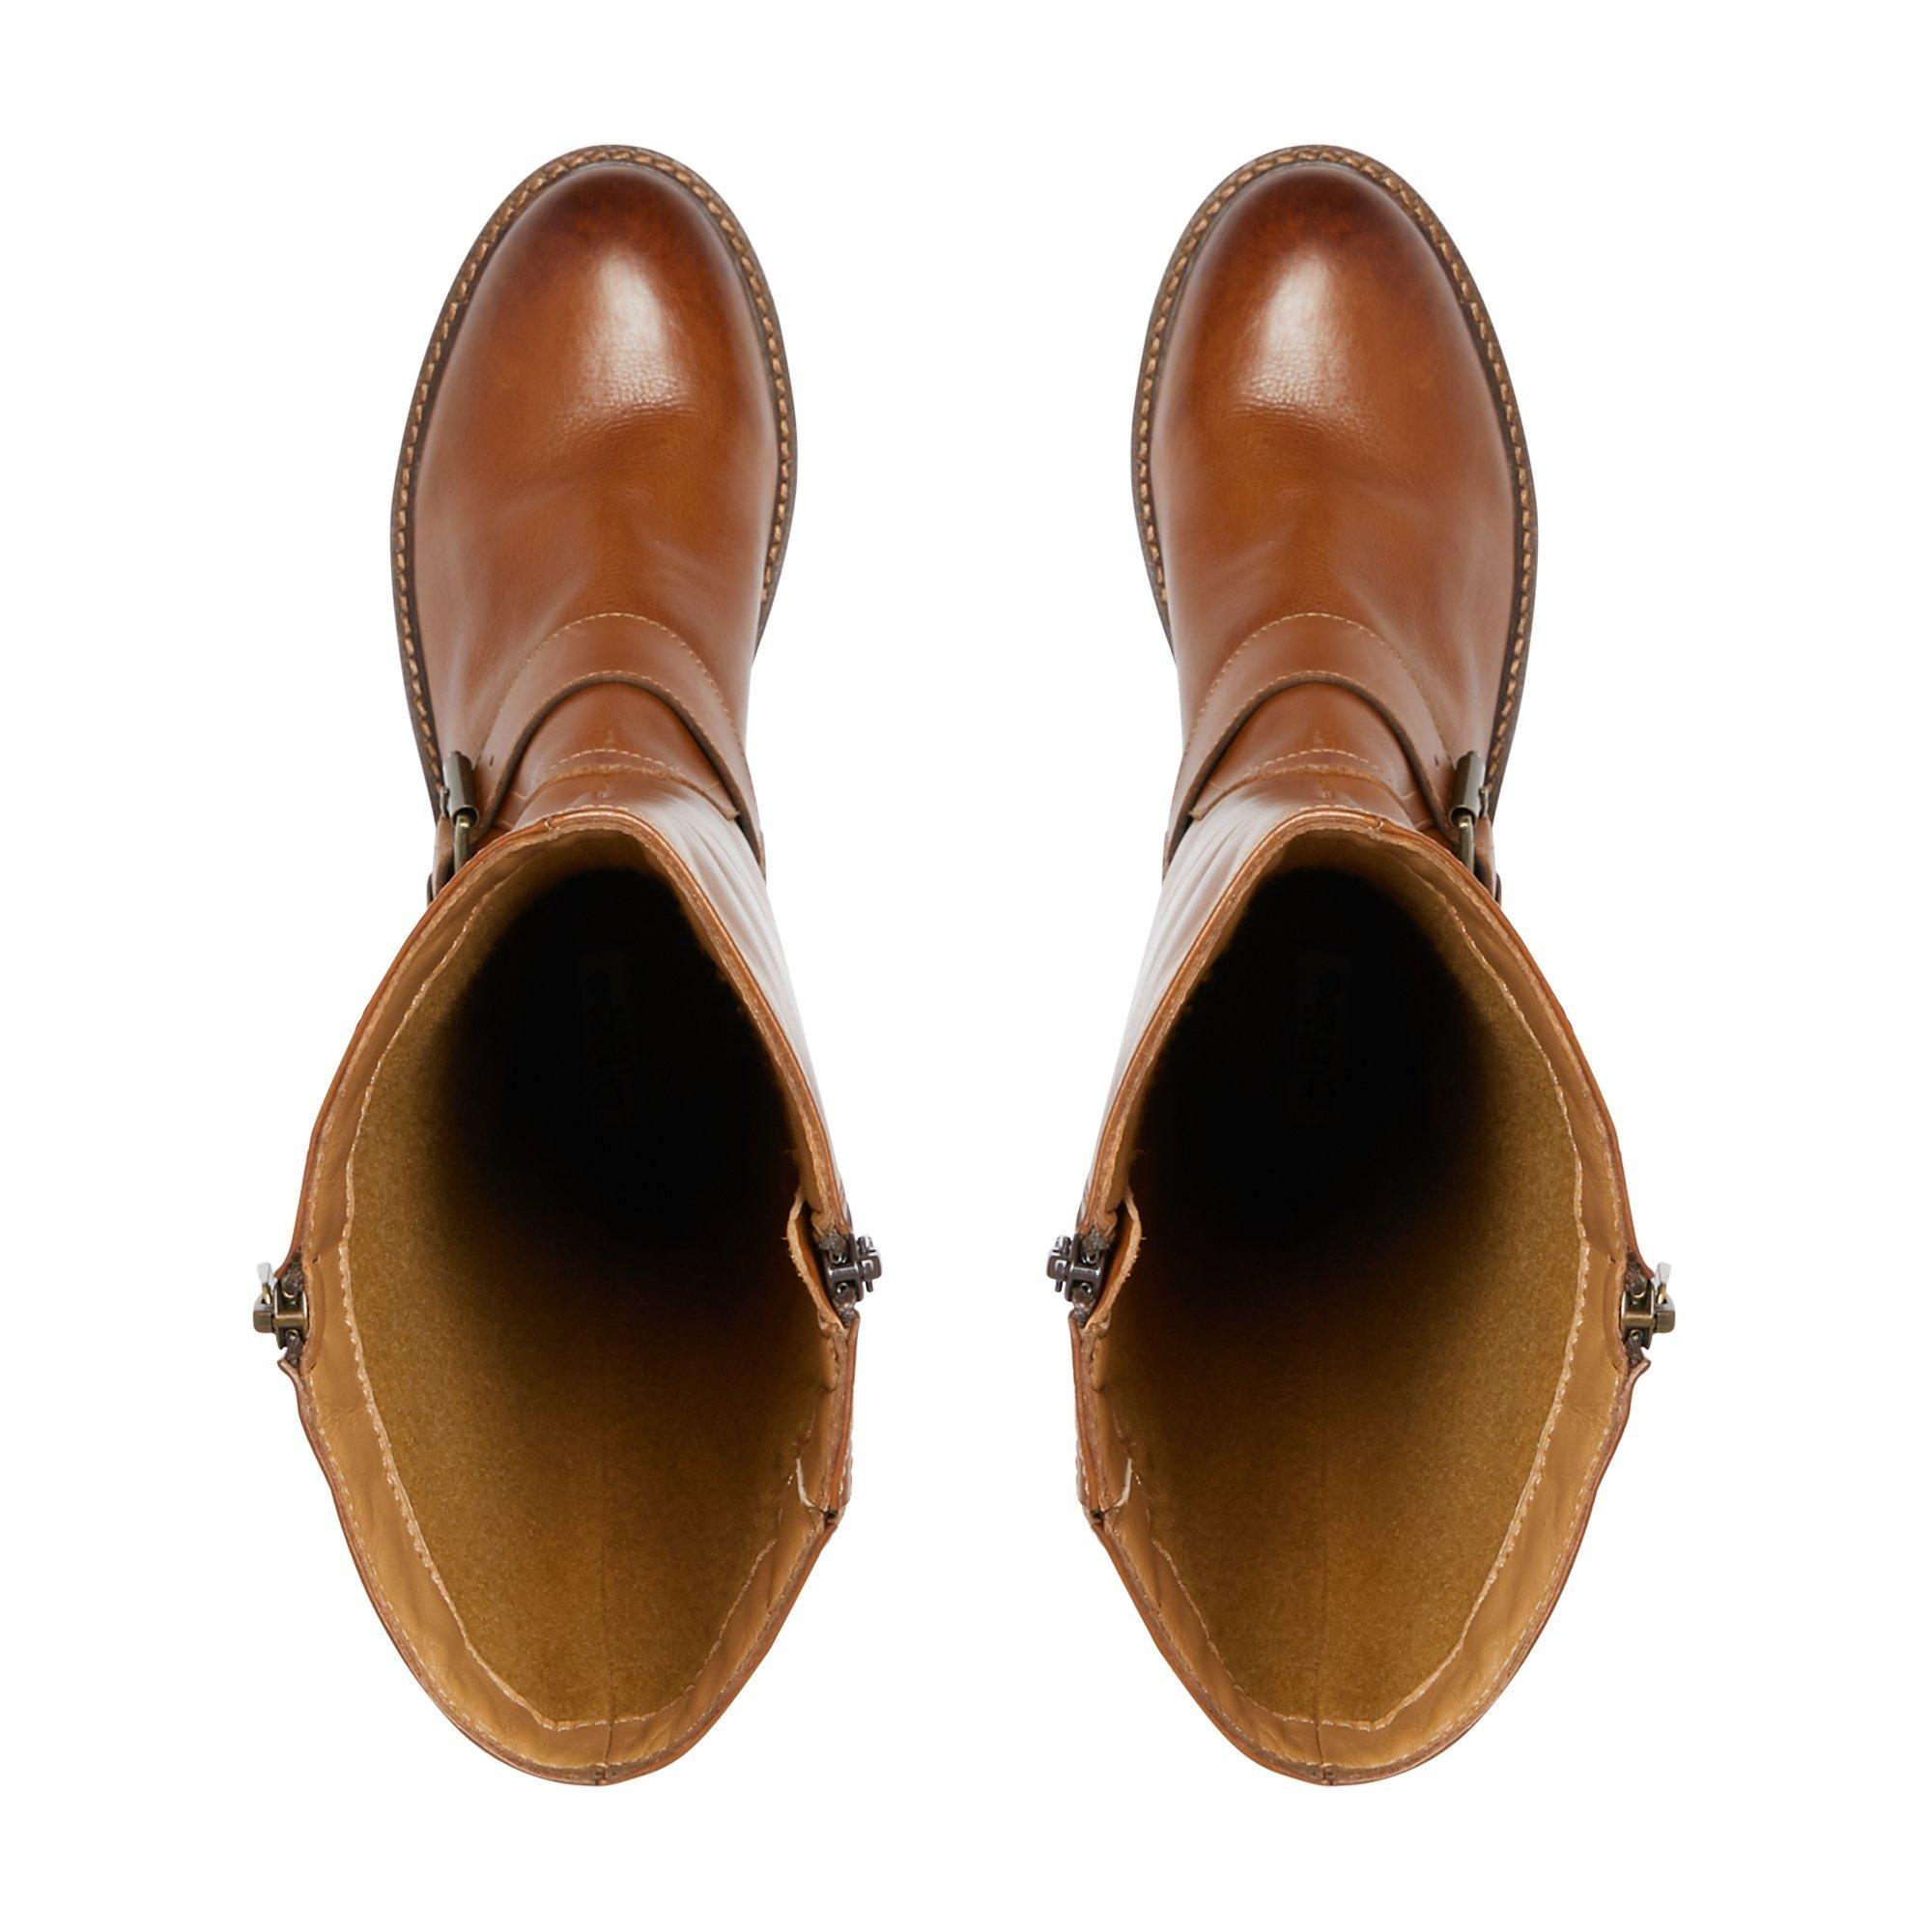 Dune Ladies TRAFALGAR T Buckle Strap Knee High Boots